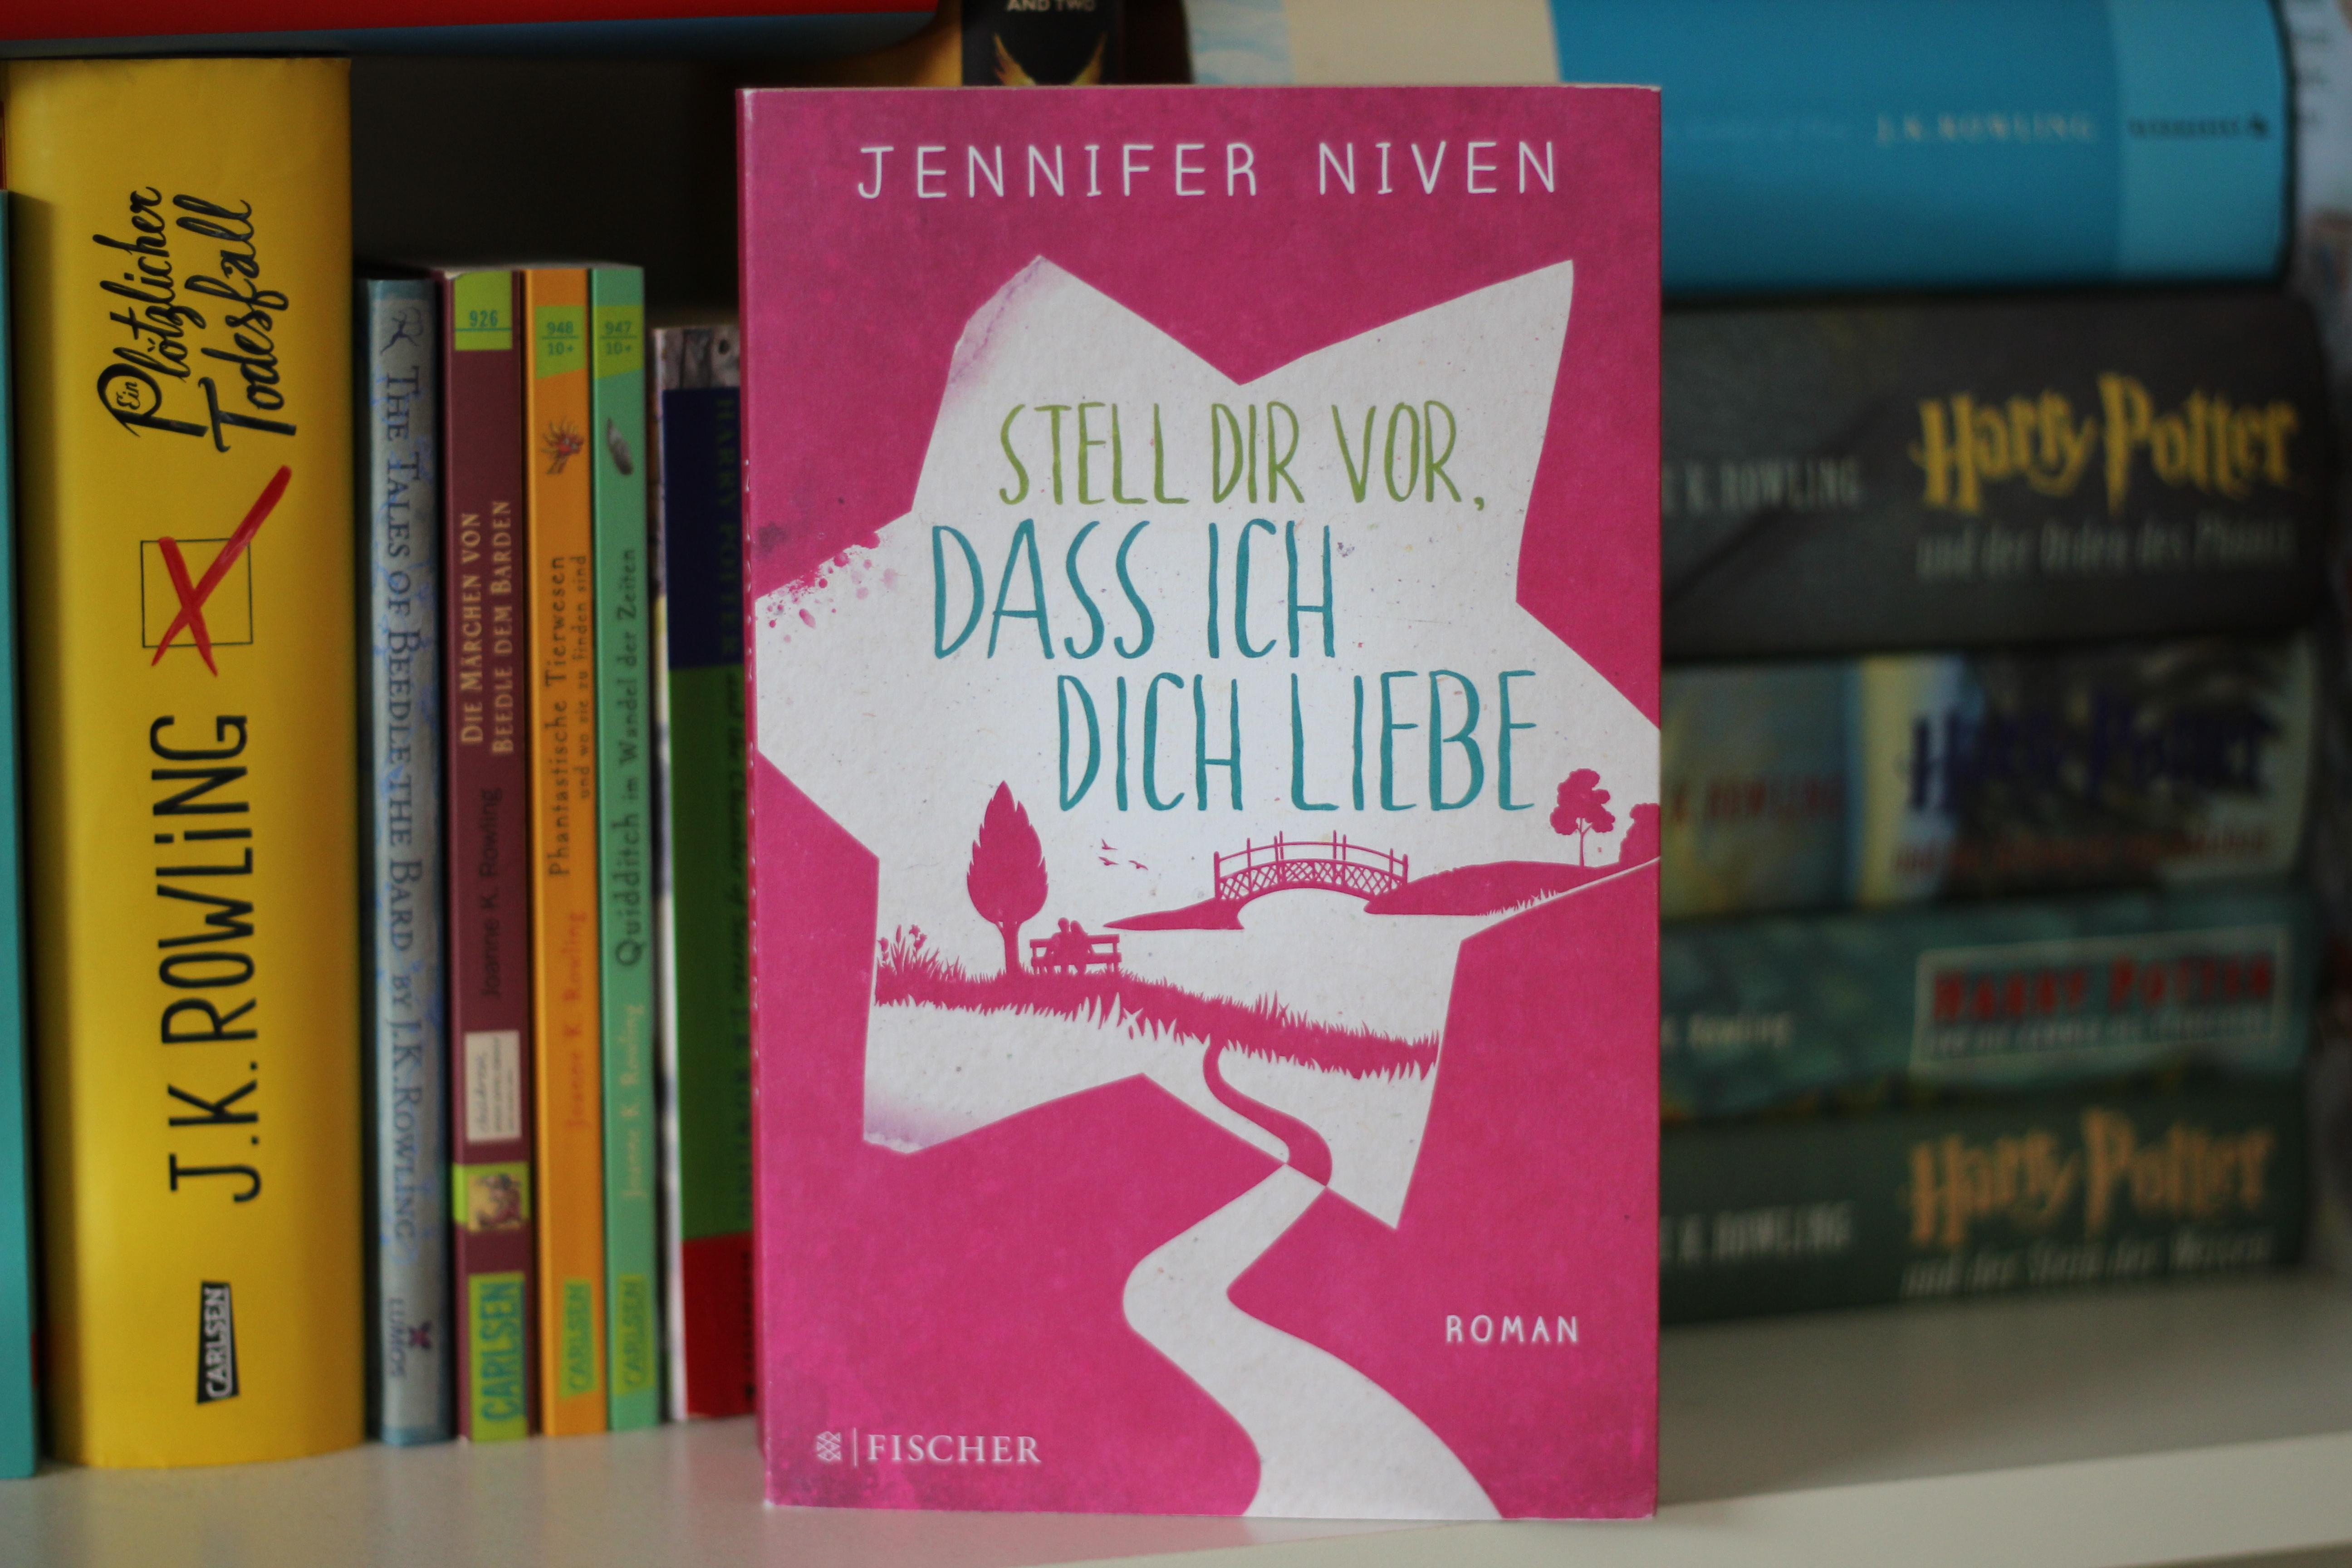 Stell dir vor, dass ich dich liebe – Jennifer Niven